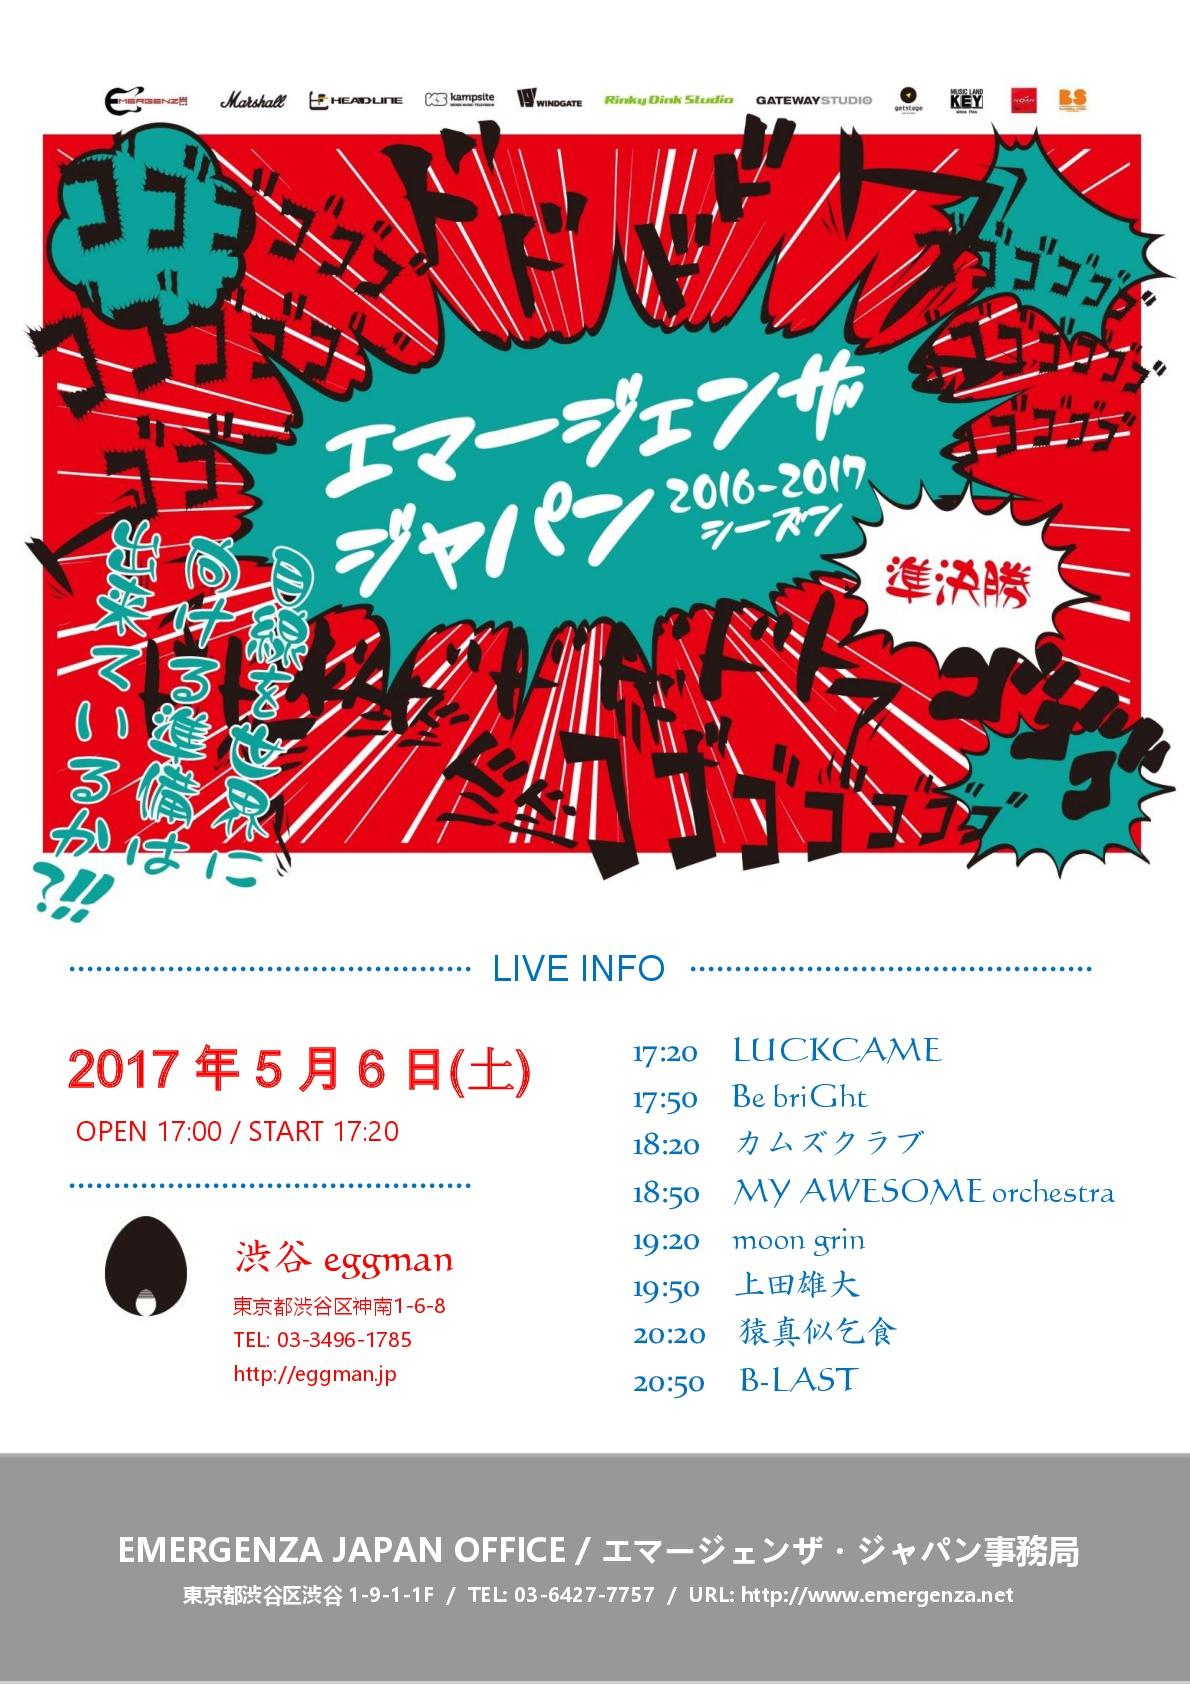 EMERGENZA JAPAN 2017 Semi final